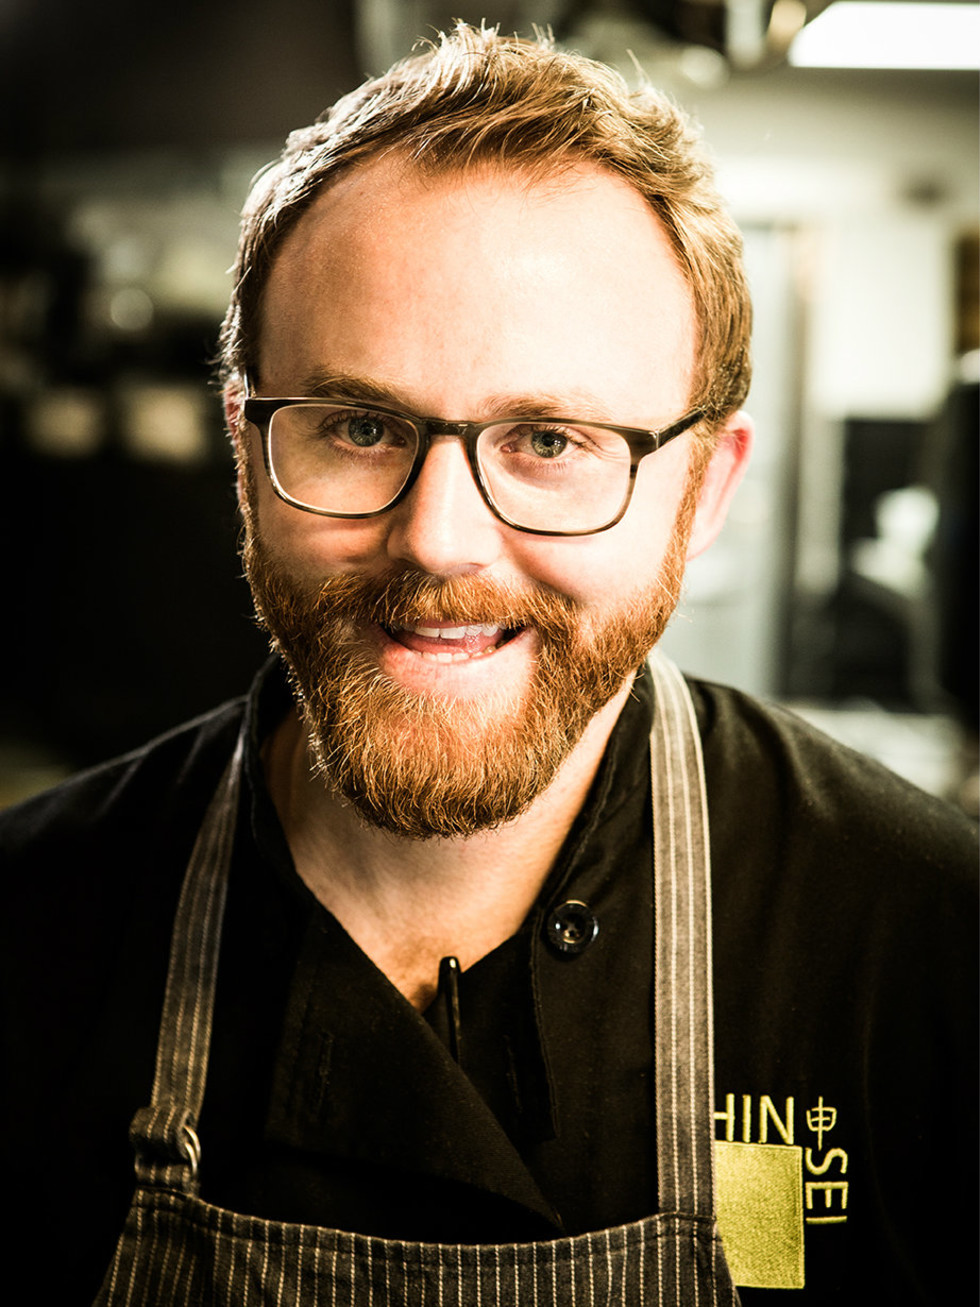 Shinsei executive chef Jeramie Robison